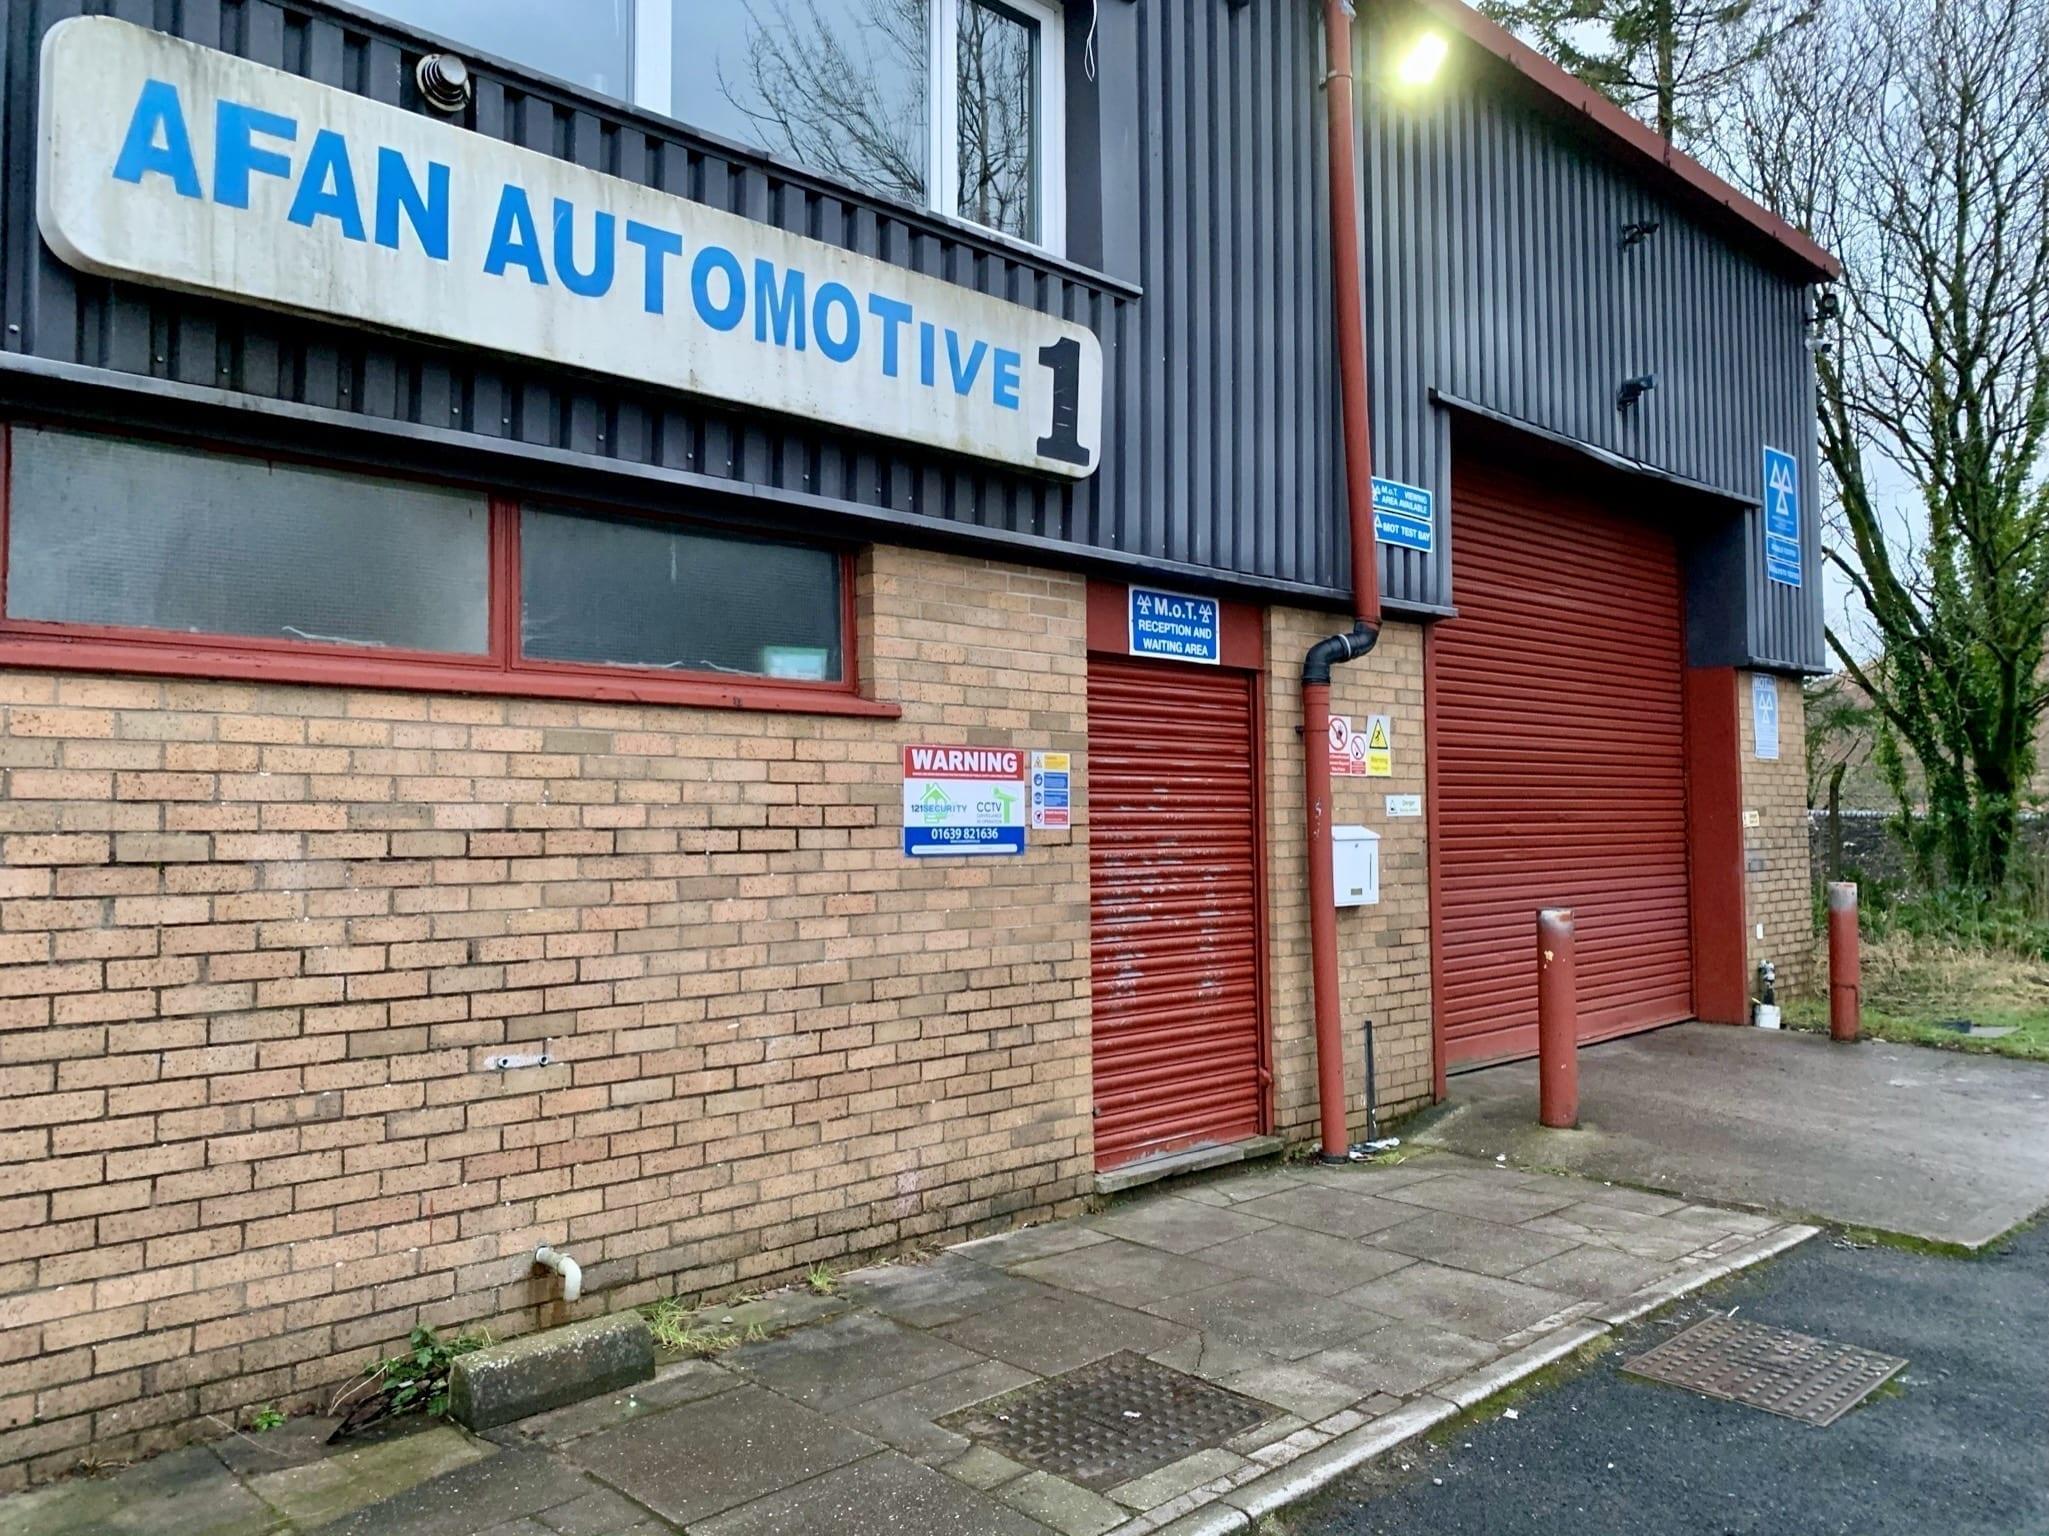 Afan Automotive